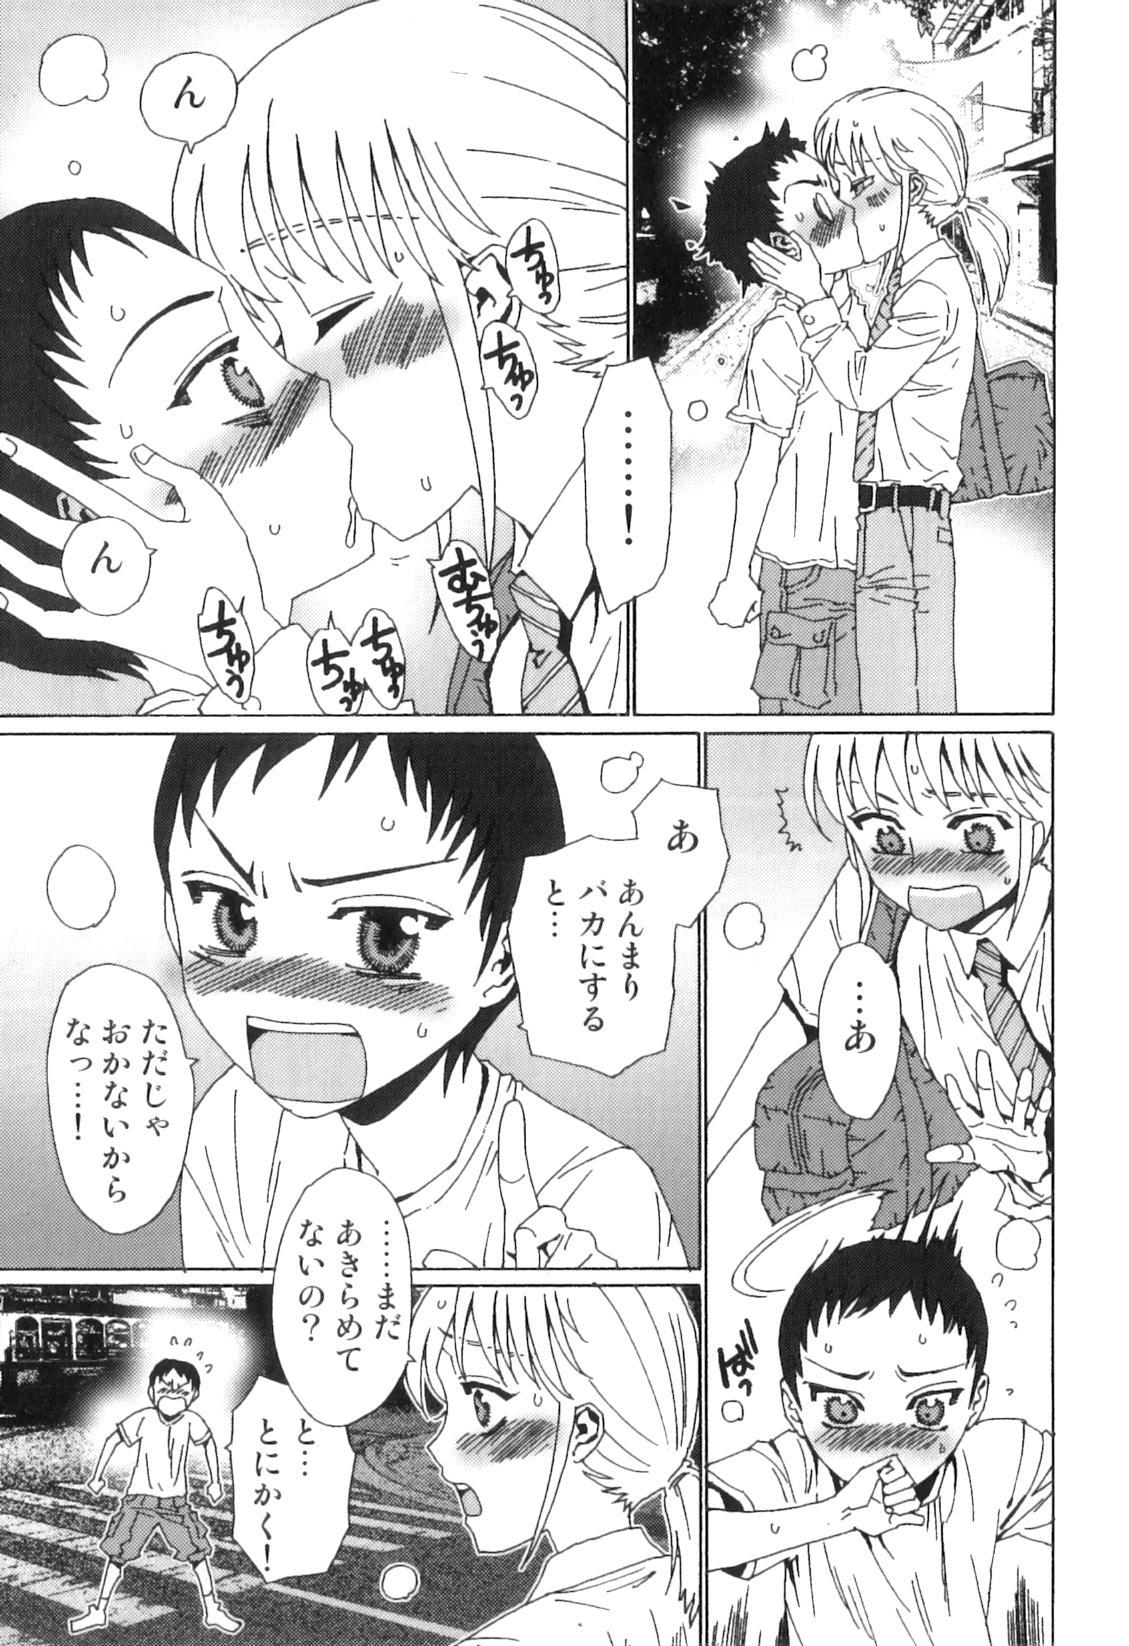 Yuni-Hapi 89